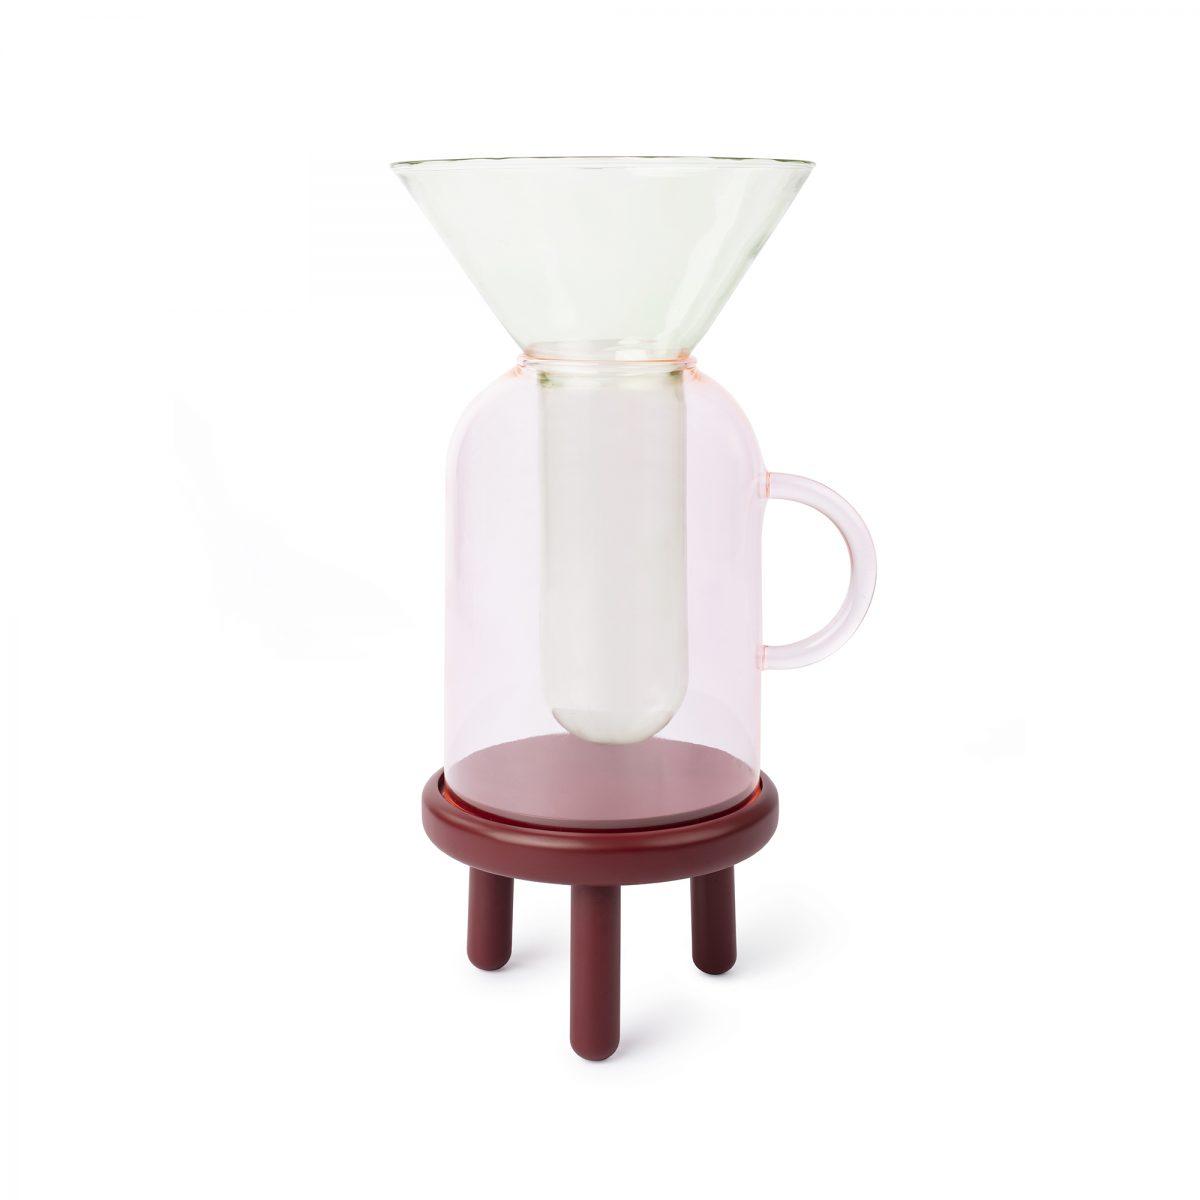 1-maison-dada-accessories-vase-1-la-fabrique-des-reves-designer-kiki-van-eijk